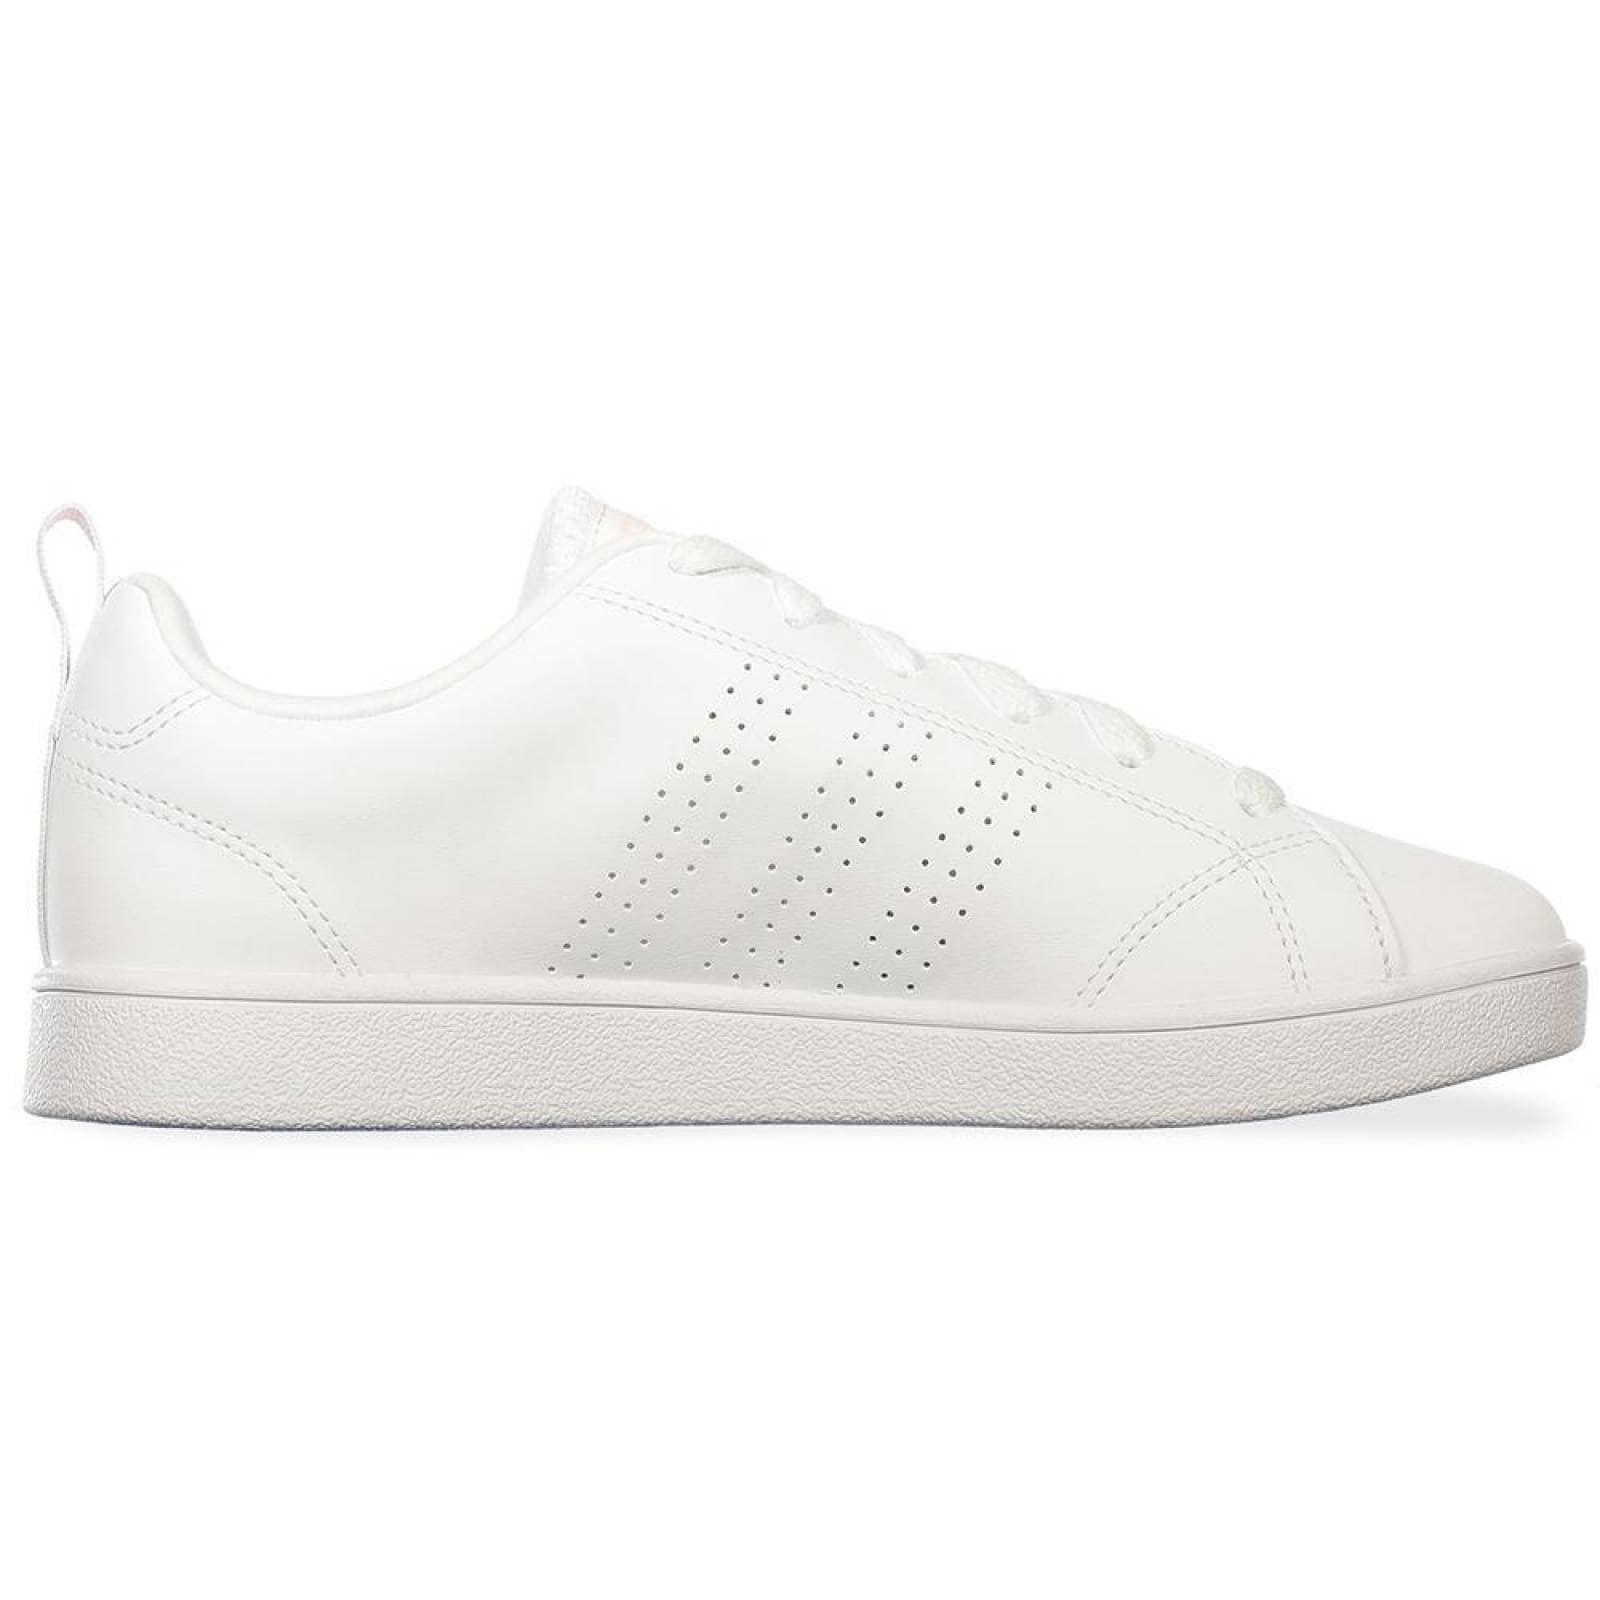 Tenis Adidas Advantage Clean W DB0581 Blanco Mujer